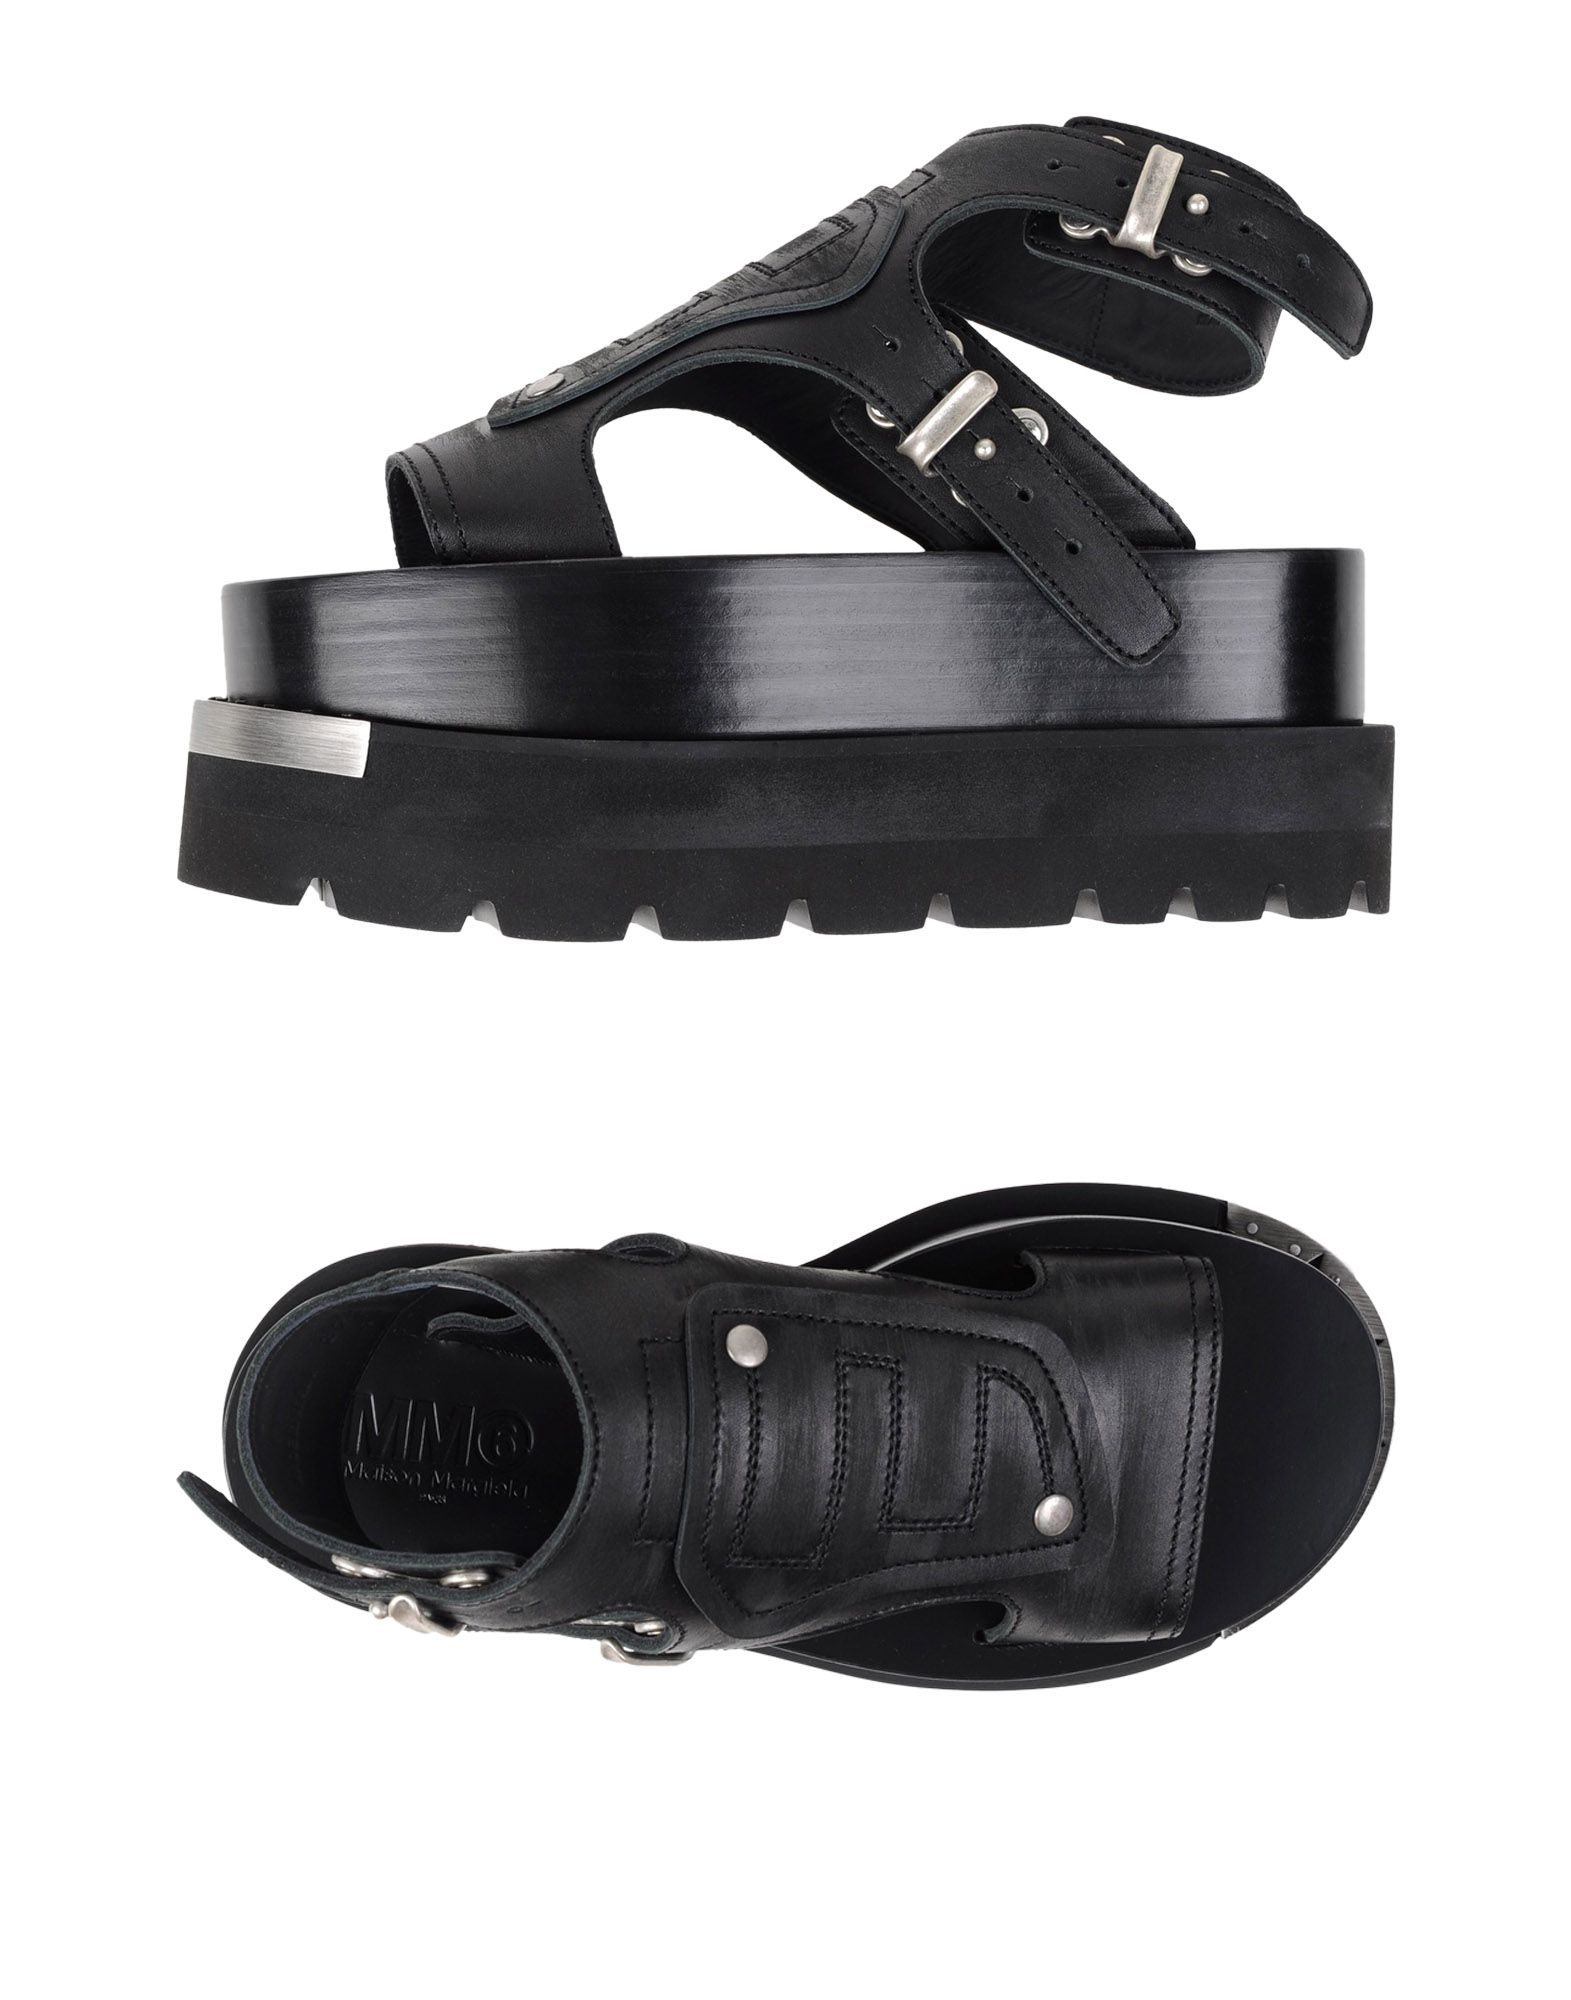 Mm6 Maison Margiela Damen Sandalen Damen Margiela  11114182XVGünstige gut aussehende Schuhe 15c212